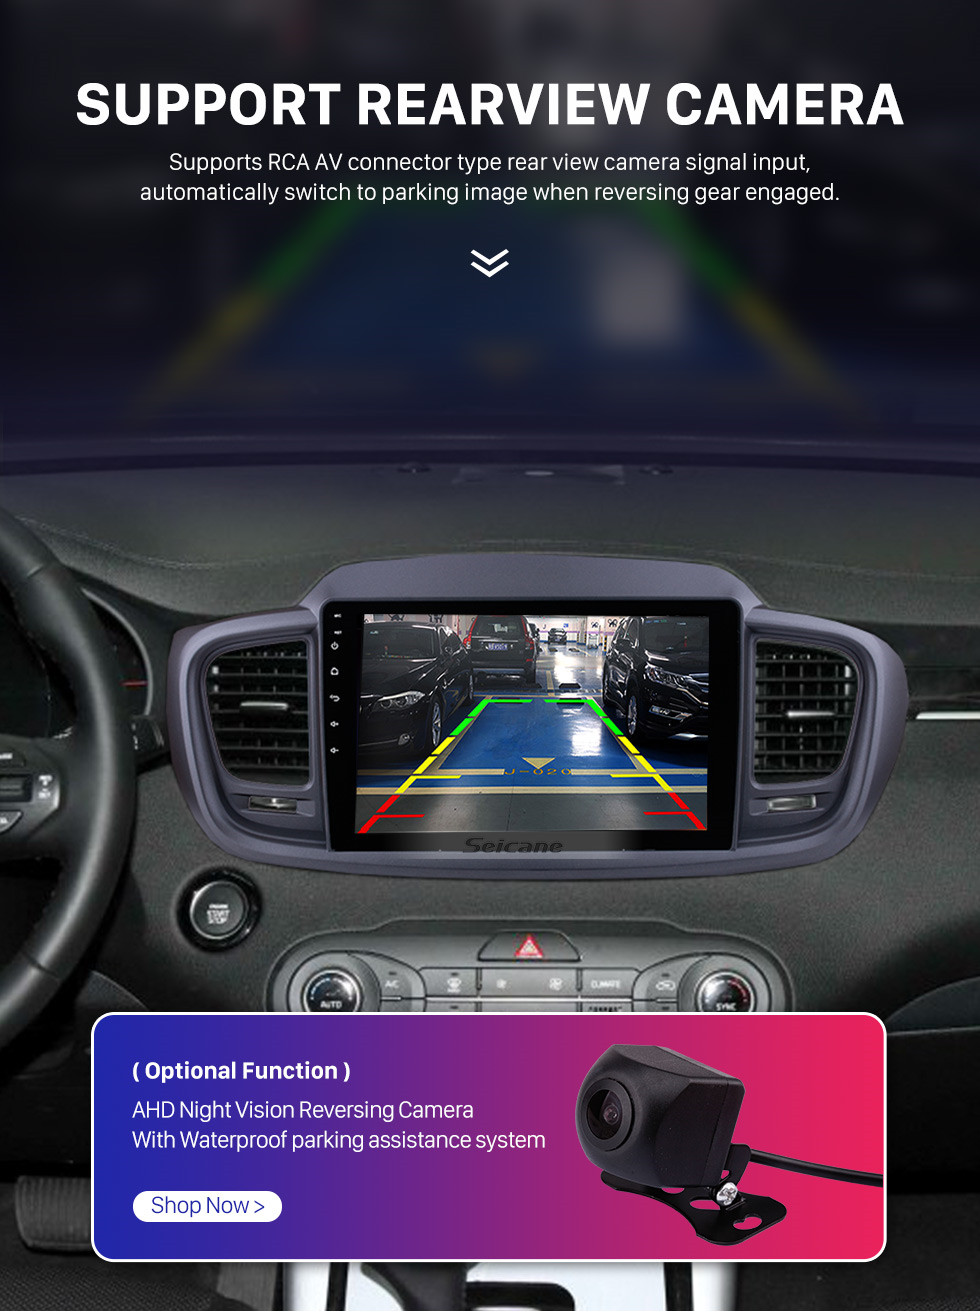 Seicane 10,1 Zoll Android 10.0 1024 * 600 Touchscreen Radio Auto Multimedia Player Für 2015 2016 KIA SORENTO (LHD) GPS Navigation Upgrade Head Unit mit 3G WiFi Radio Bluetooth Musik USB Mirror Link Unterstützung DVR OBD2 Backup Kamera Lenkradsteuerung TPMS